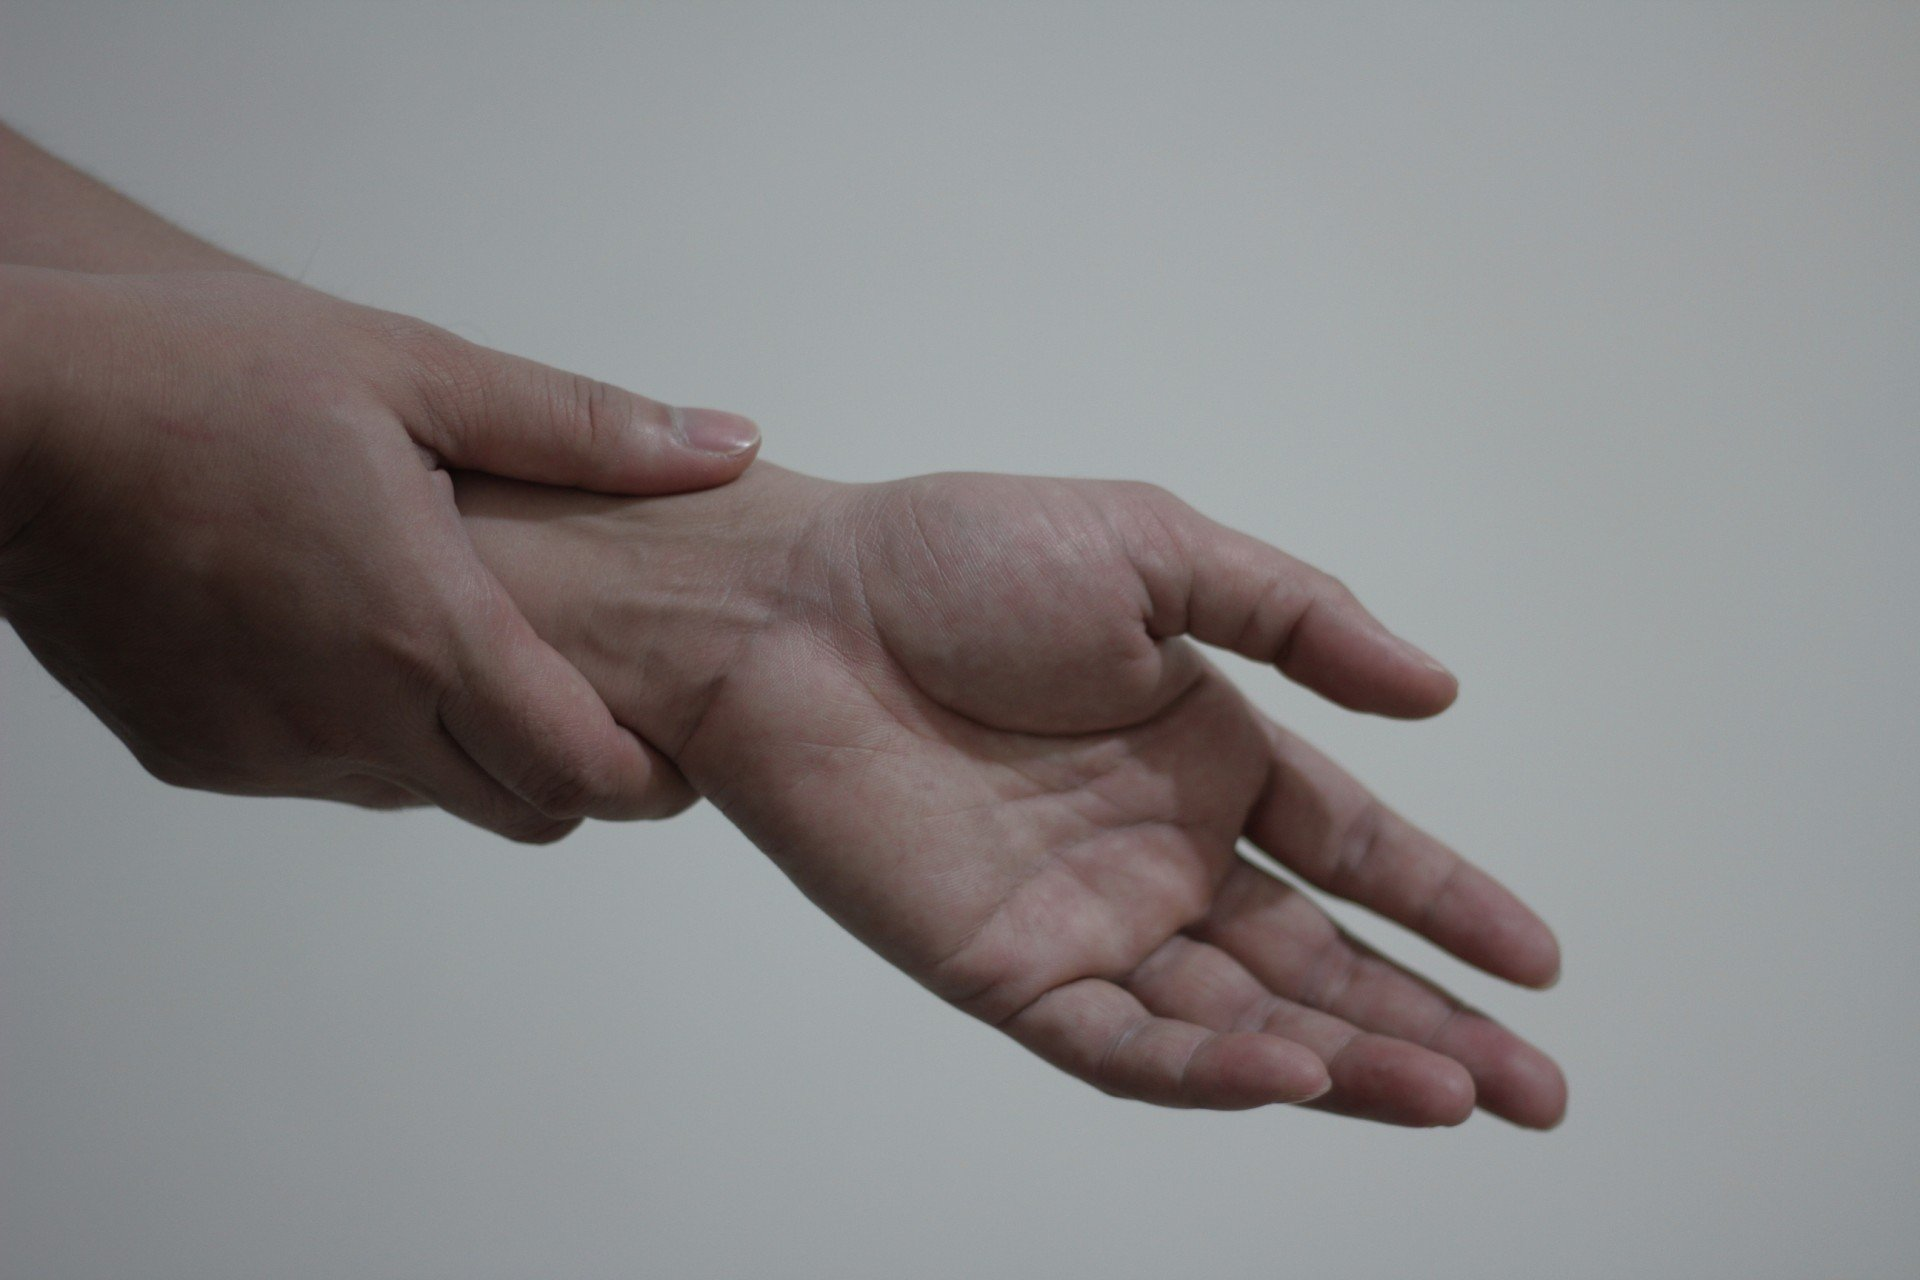 Persona tocándose la muñeca | Imagen tomada de: Public Domain Pictures